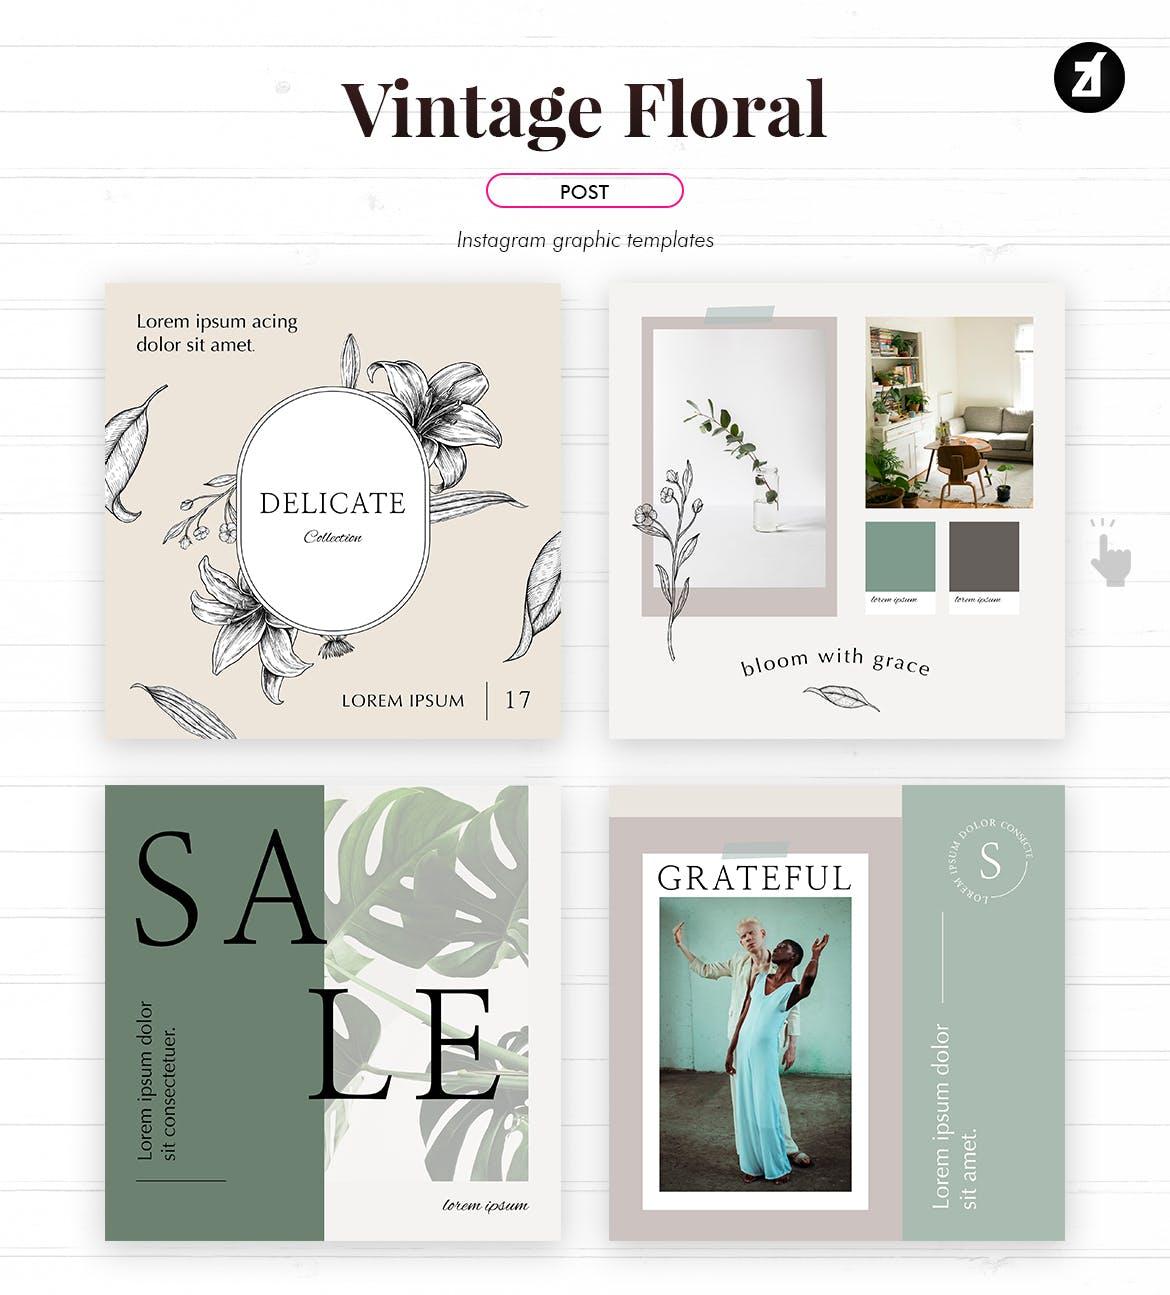 复古花卉品牌推广社交新媒体海报设计PSD模板 Vintage Floral Social Media Graphic Templates插图(1)